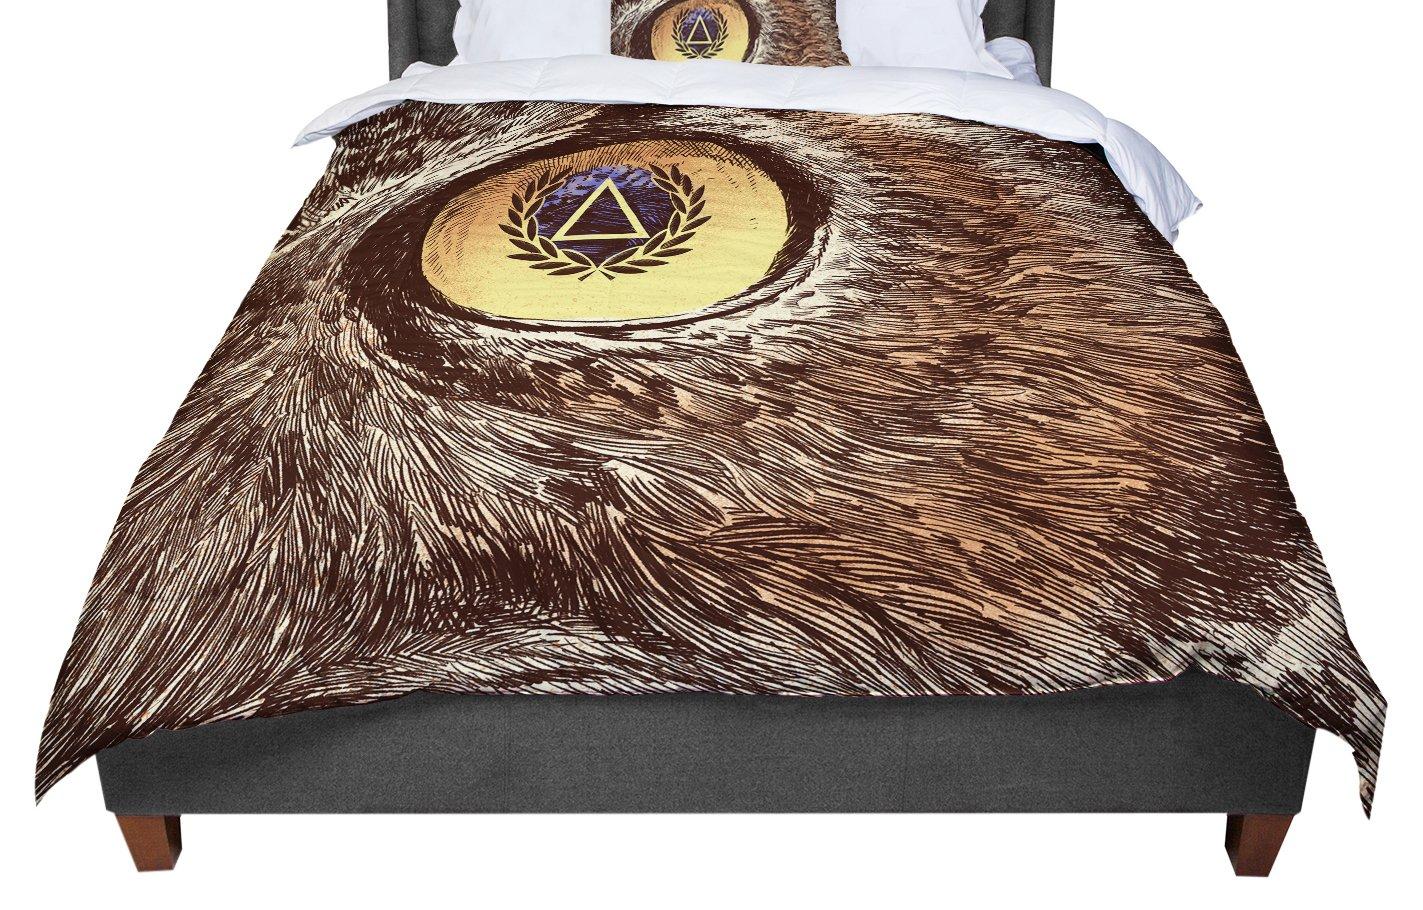 68 X 88 KESS InHouse BarmalisiRTB Sharp Eye Owl Twin Comforter